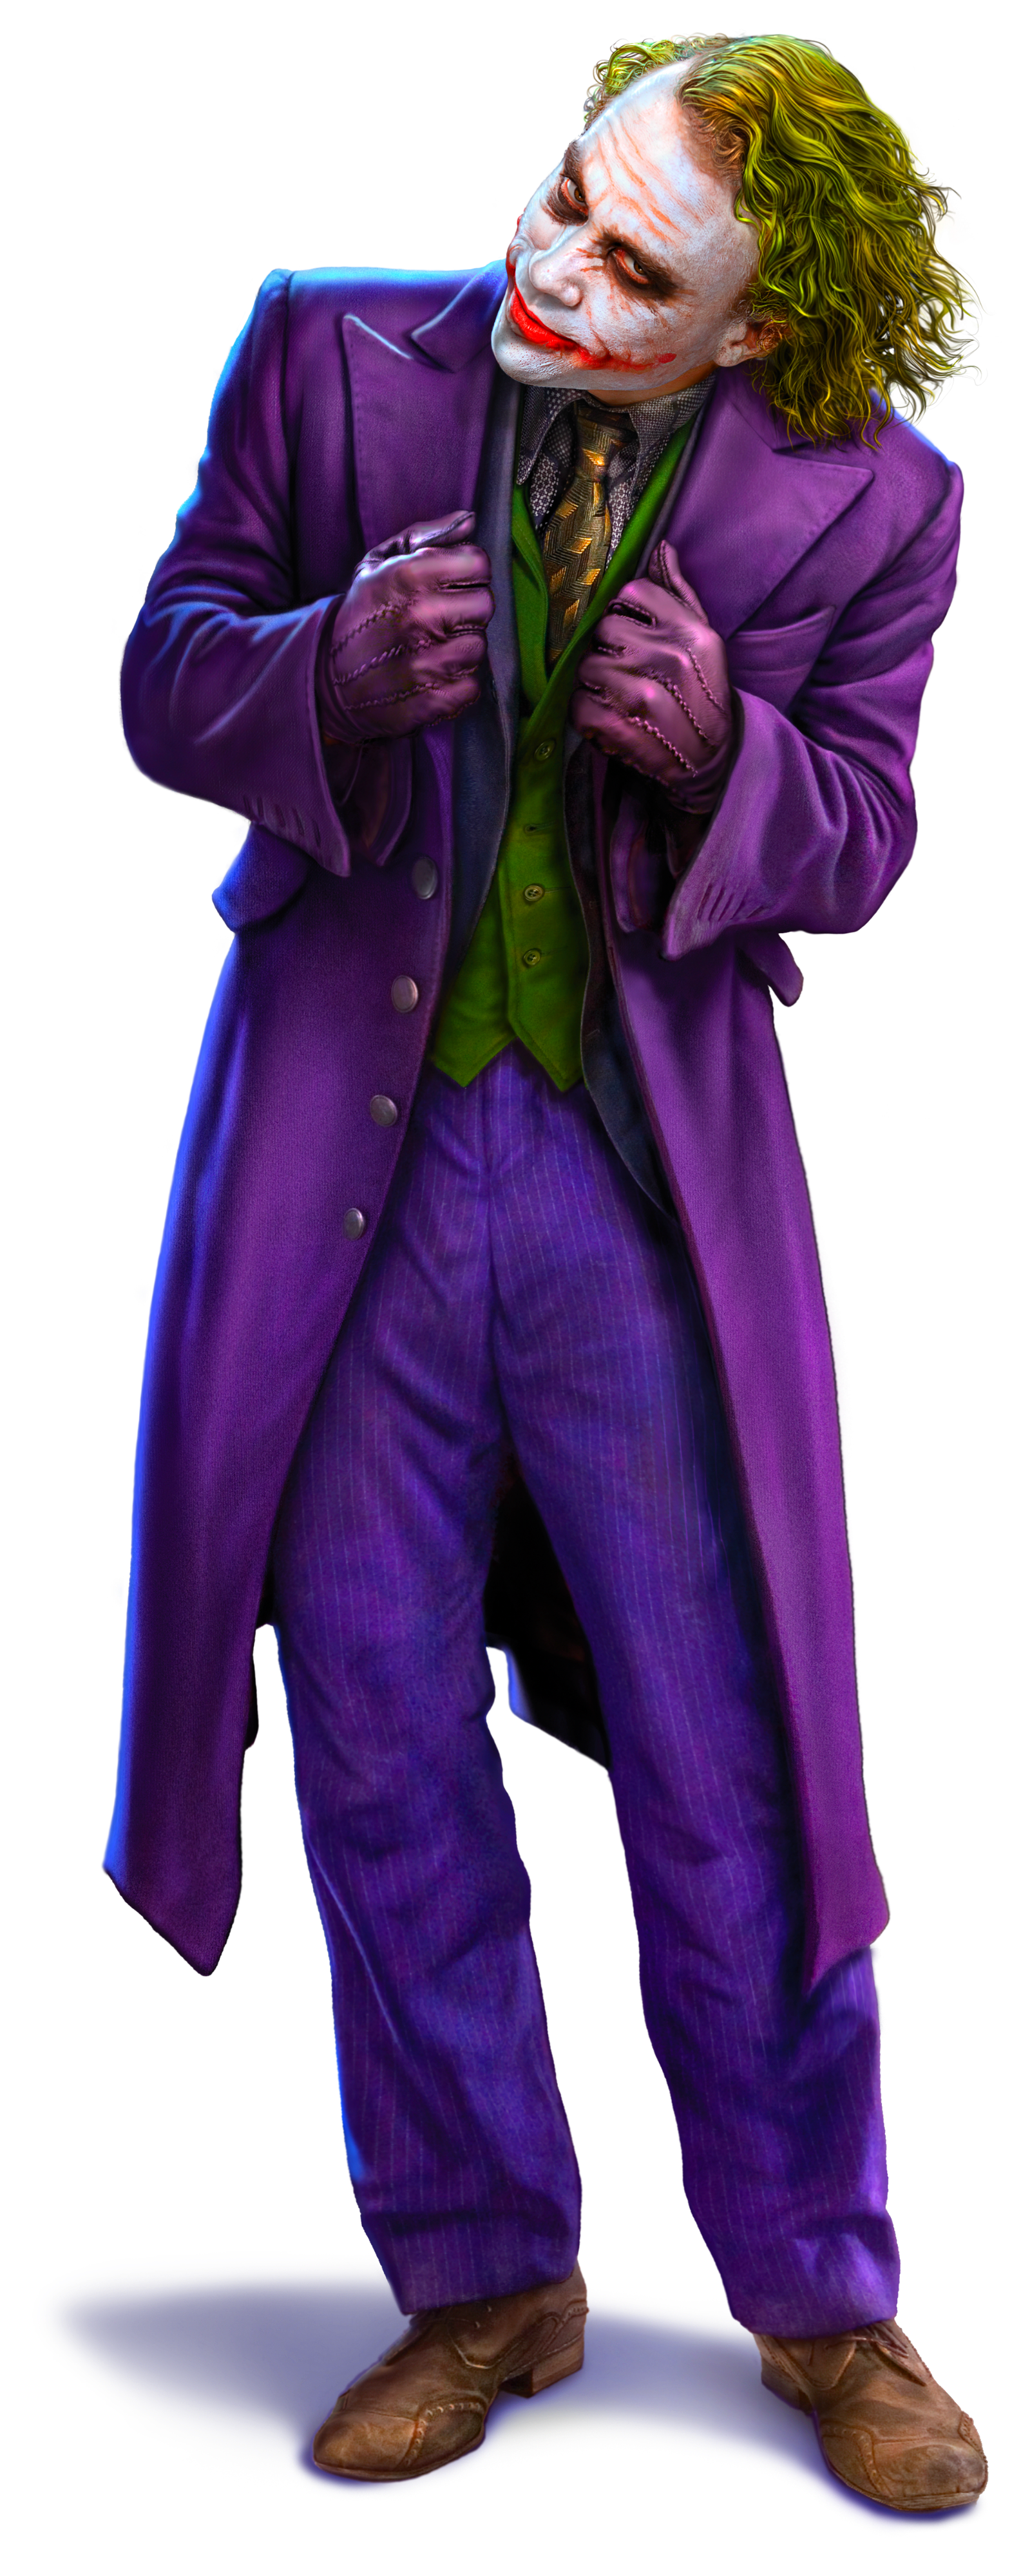 Joker by AlexelZ on DeviantArt